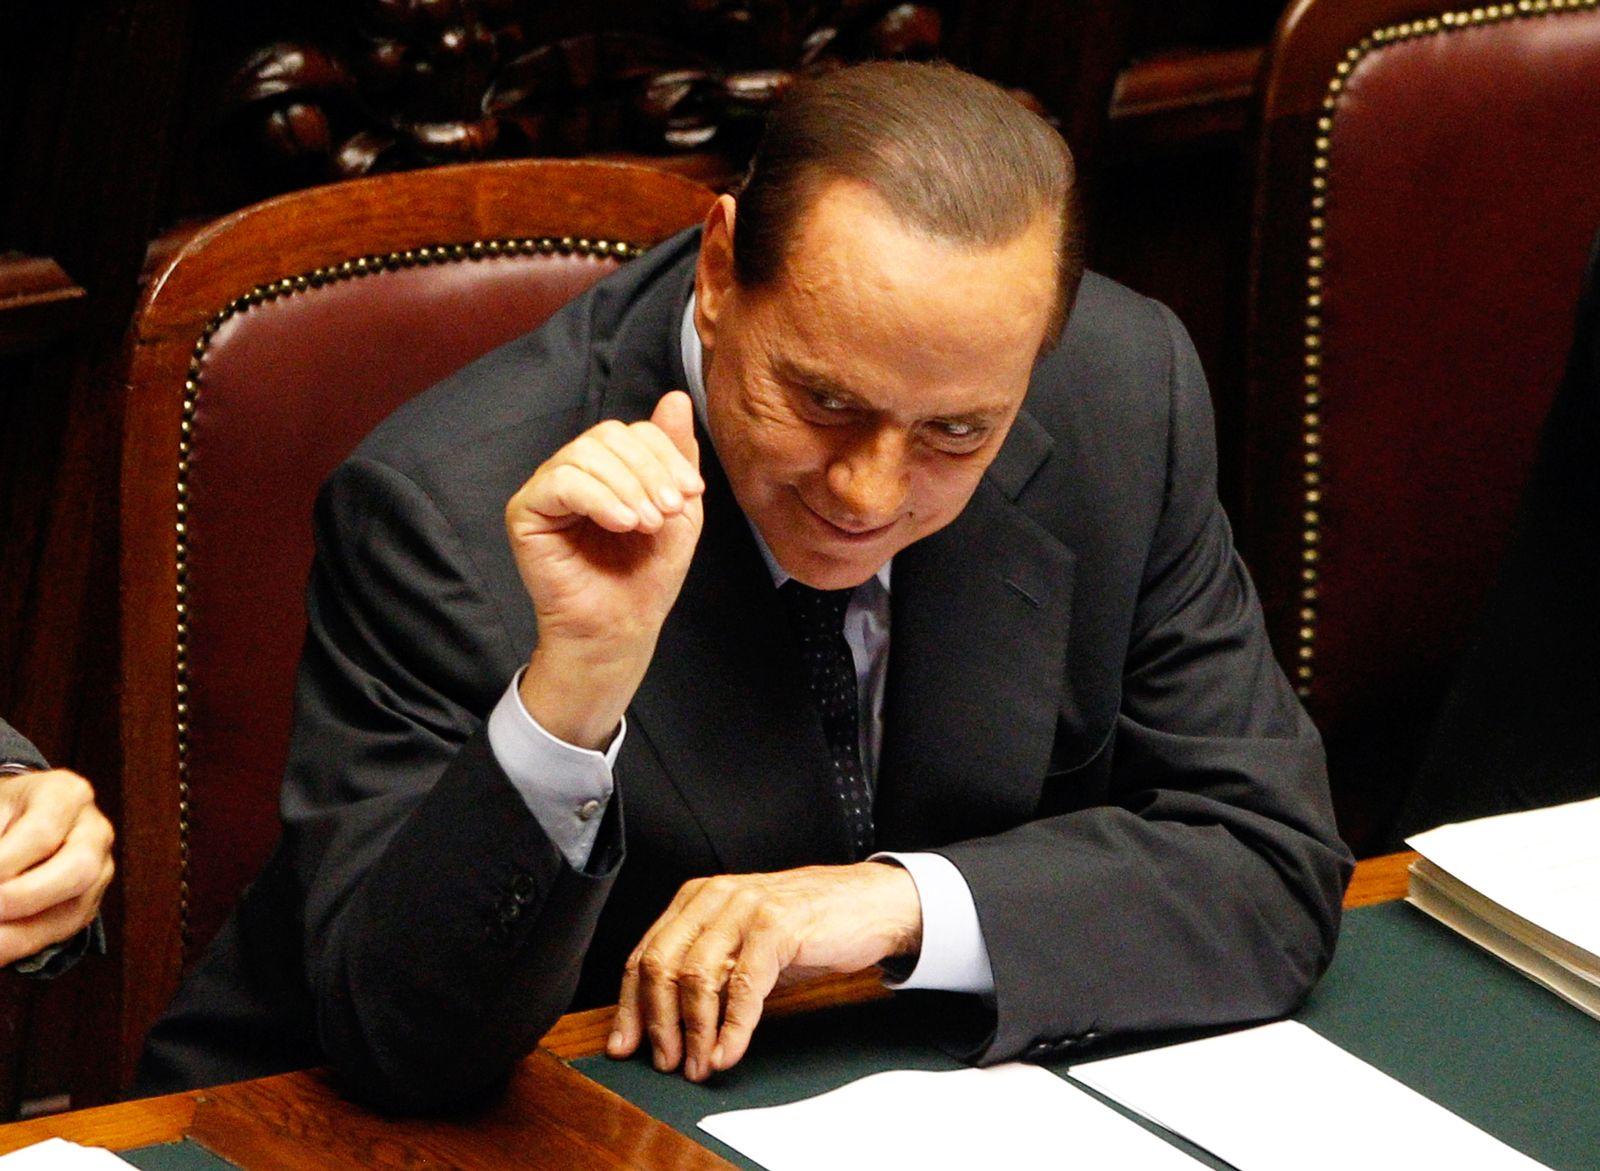 Silvio Berlusconi/ XXL aufgehellt